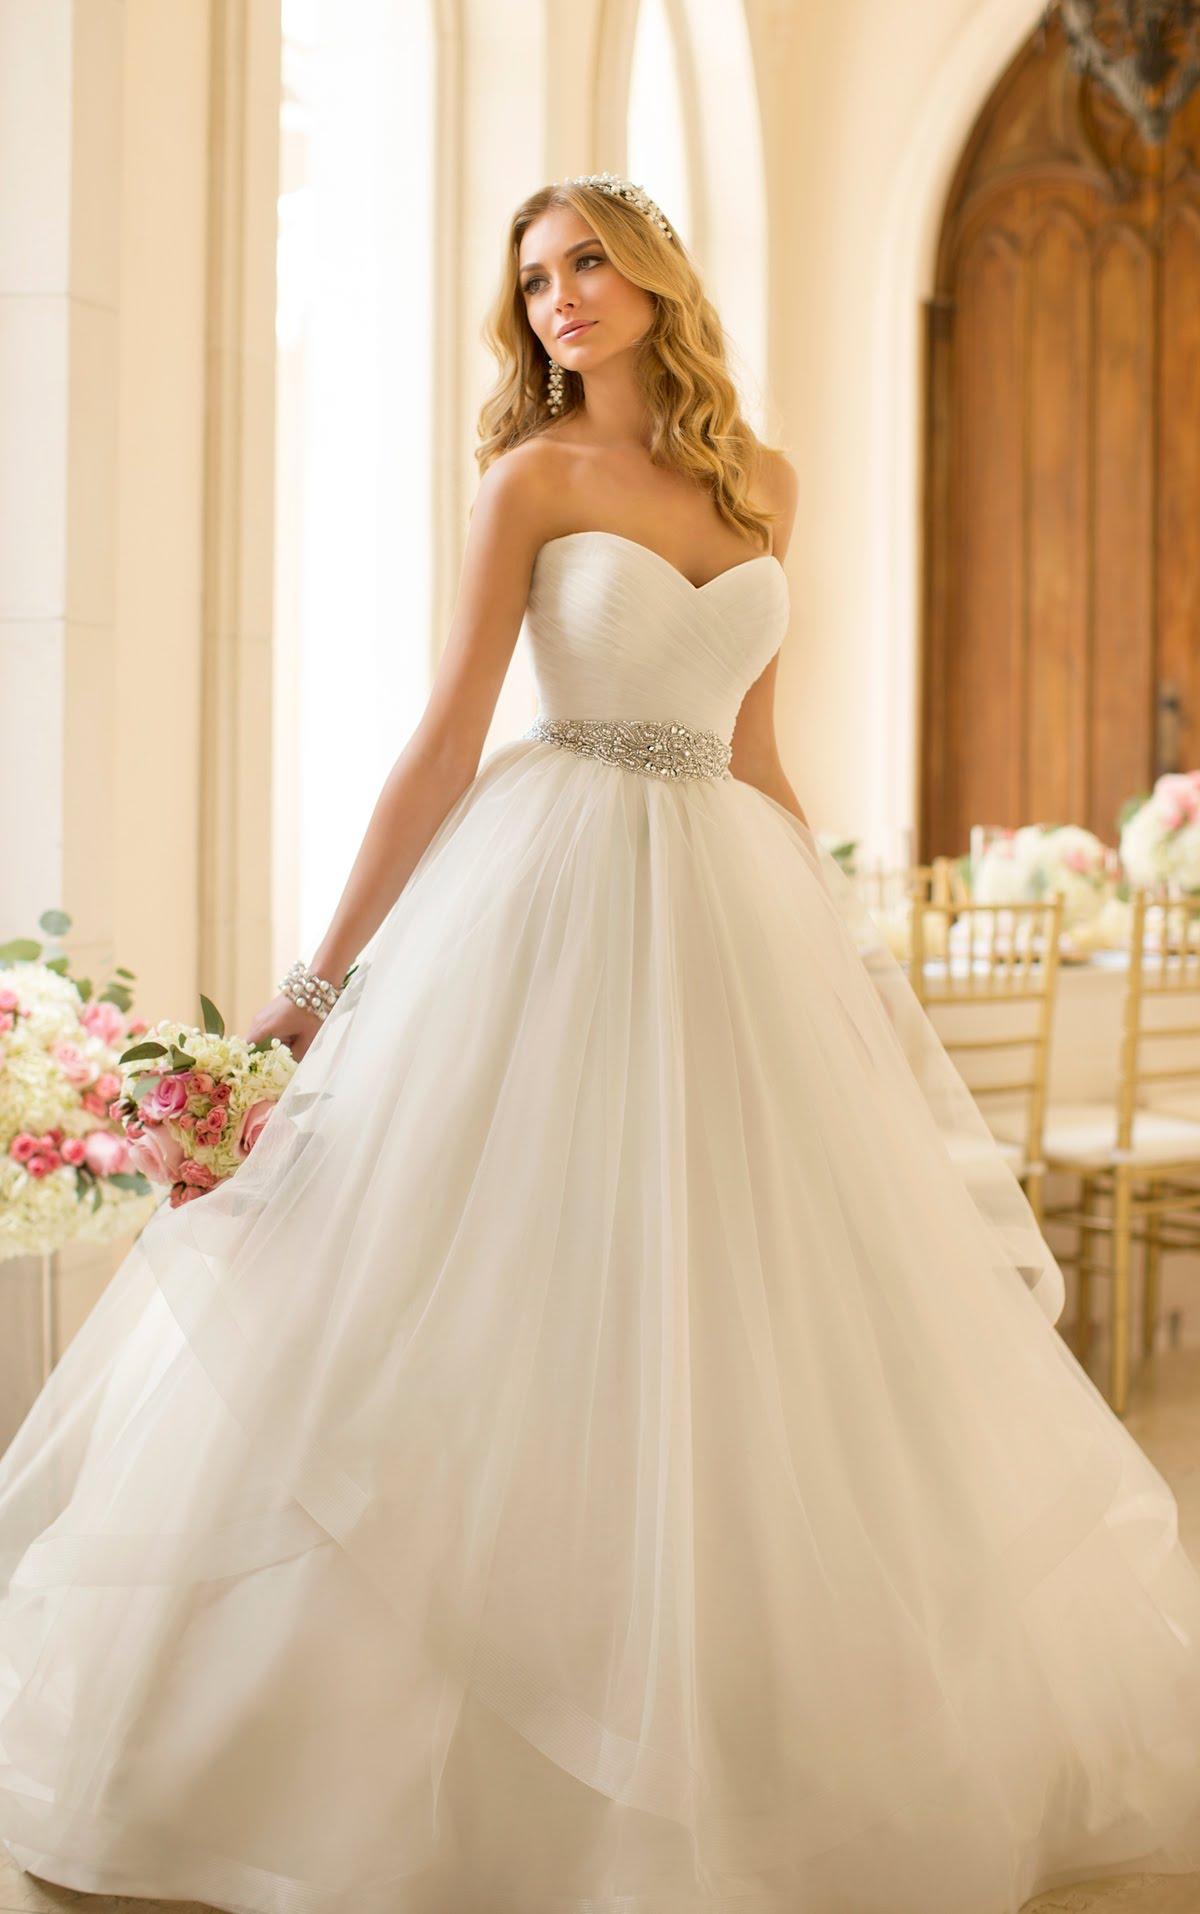 بالصور احدث فساتين الزفاف , موديلات فساتين زفاف جديده لعام 2019 3724 6